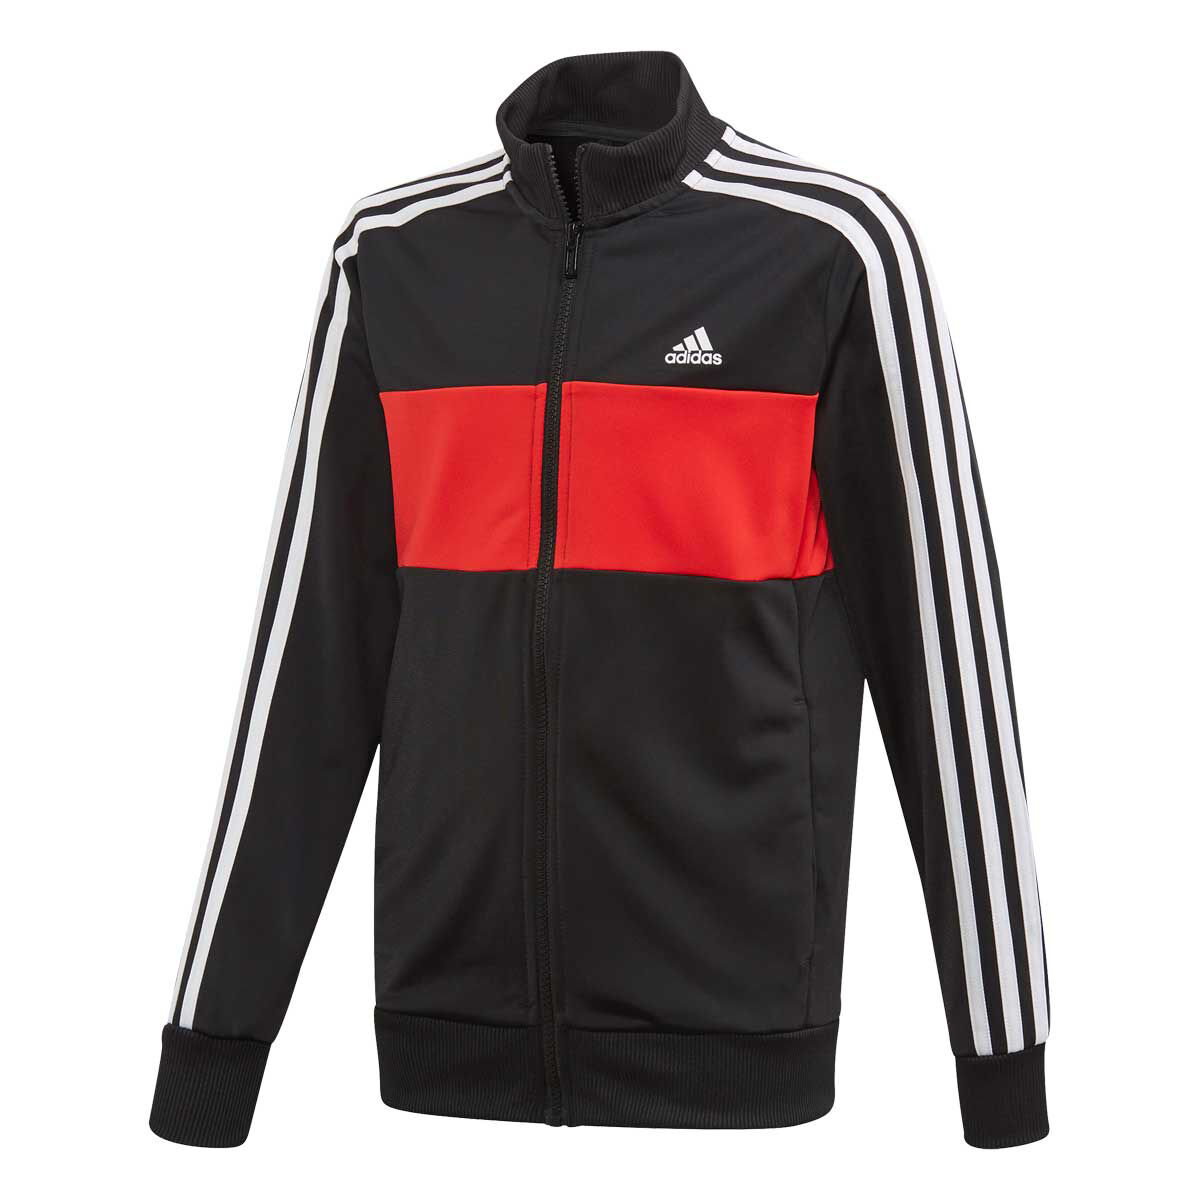 Soccer Clothing rebel